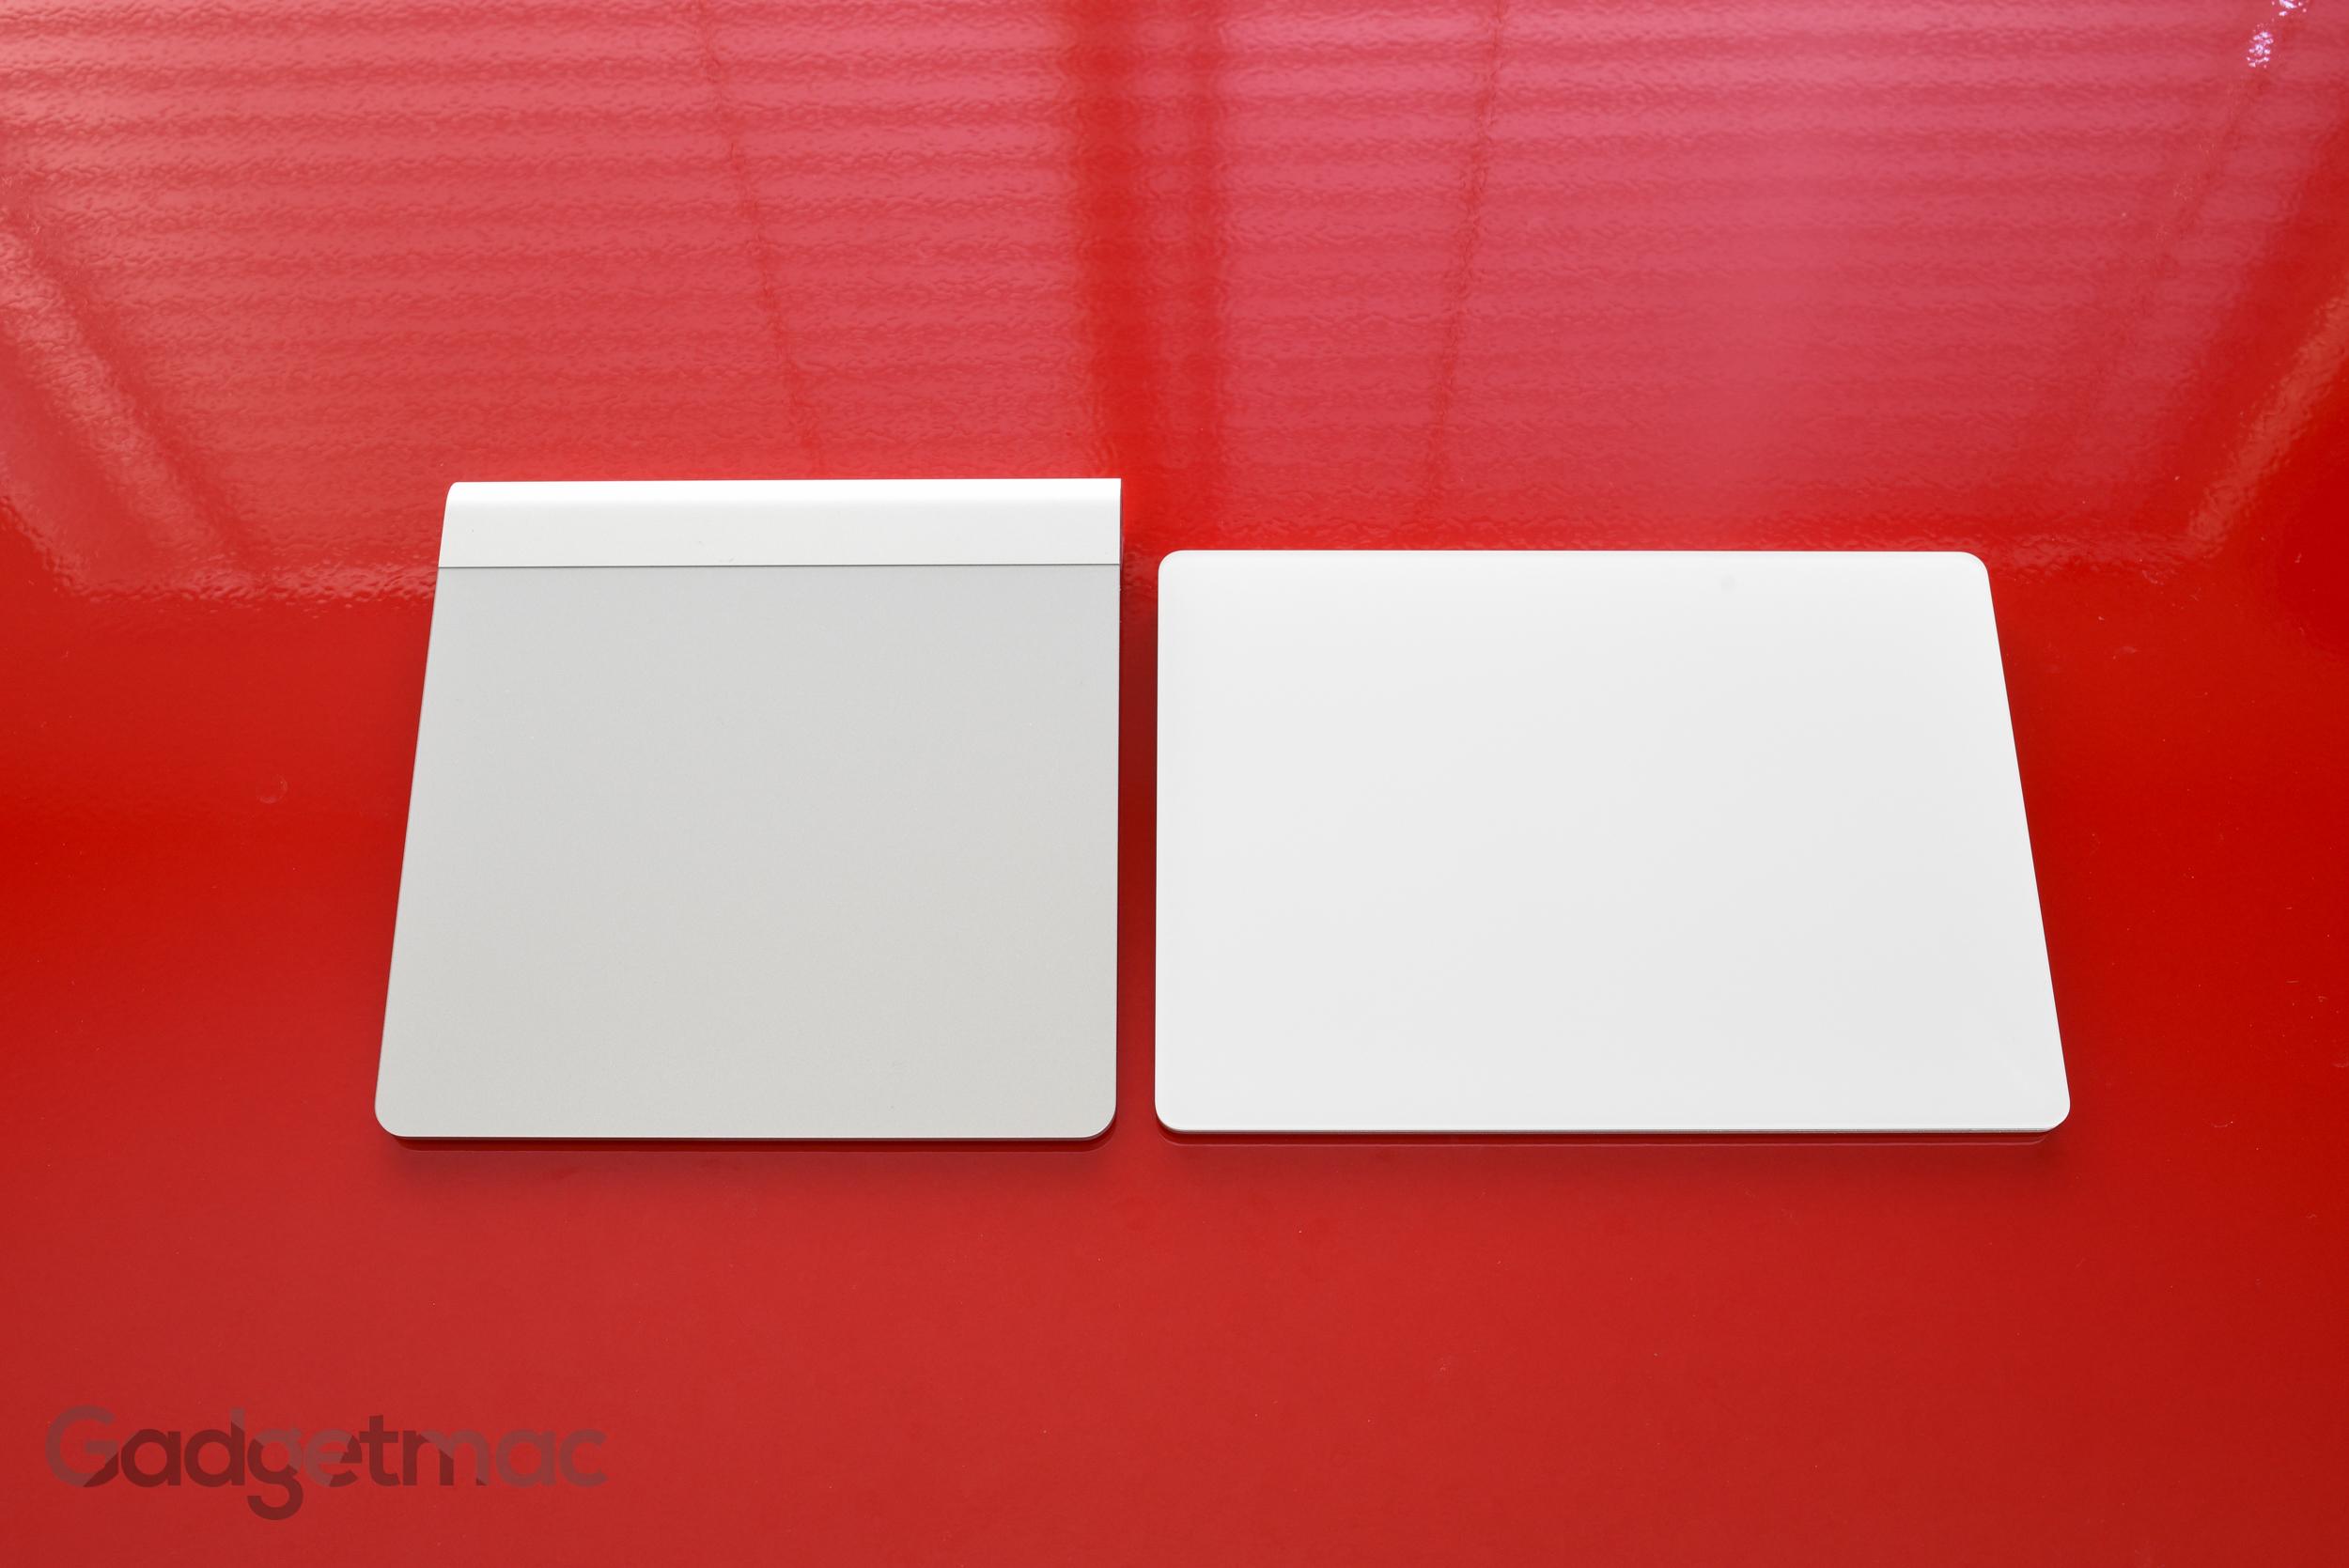 apple-magic-trackpad-2-vs-magic-trackpad.jpg